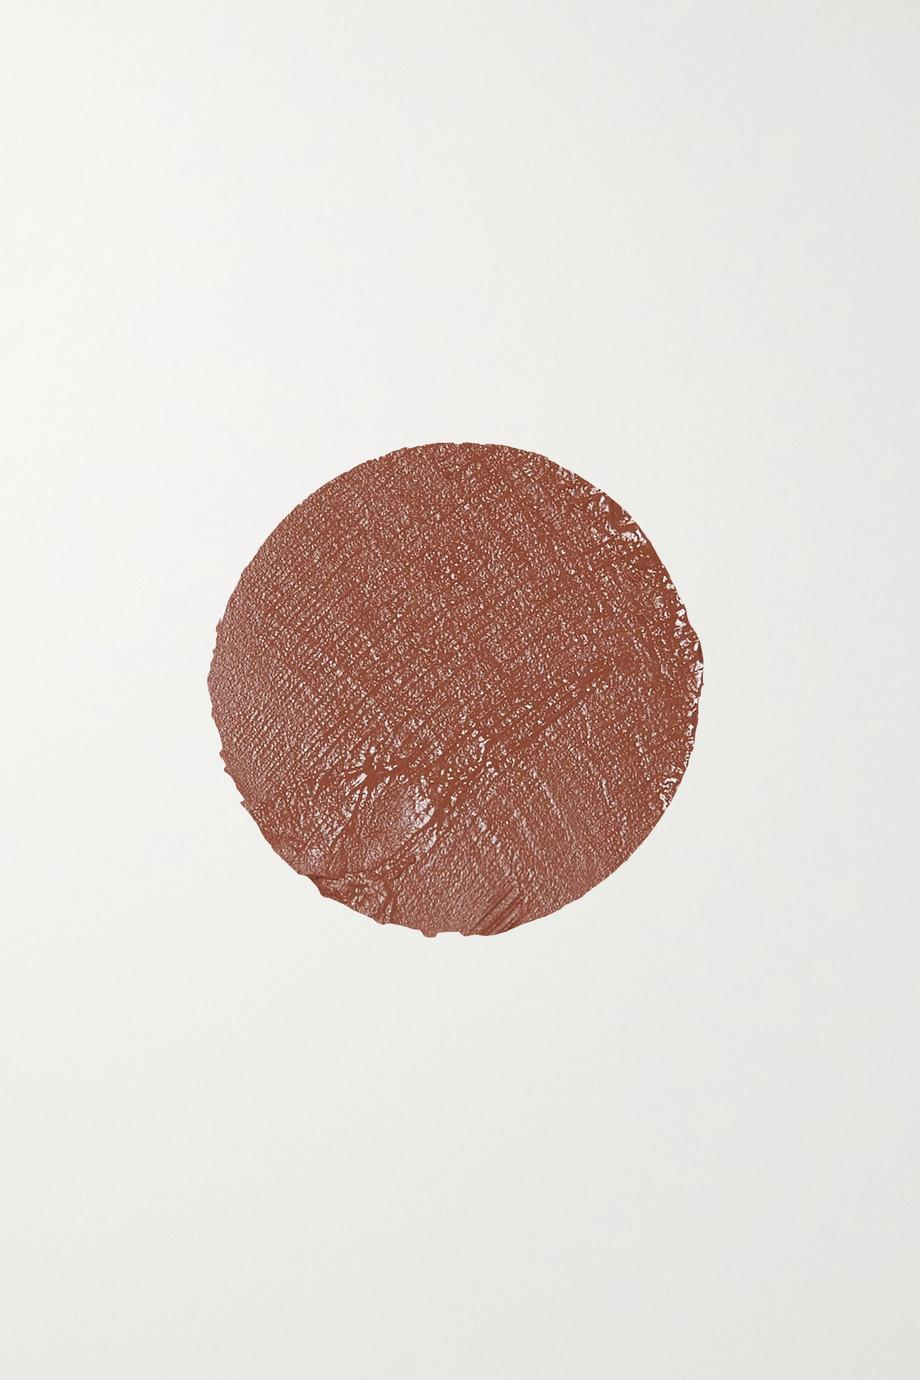 Huda Beauty Power Bullet Cream Glow Lipstick - Hustla